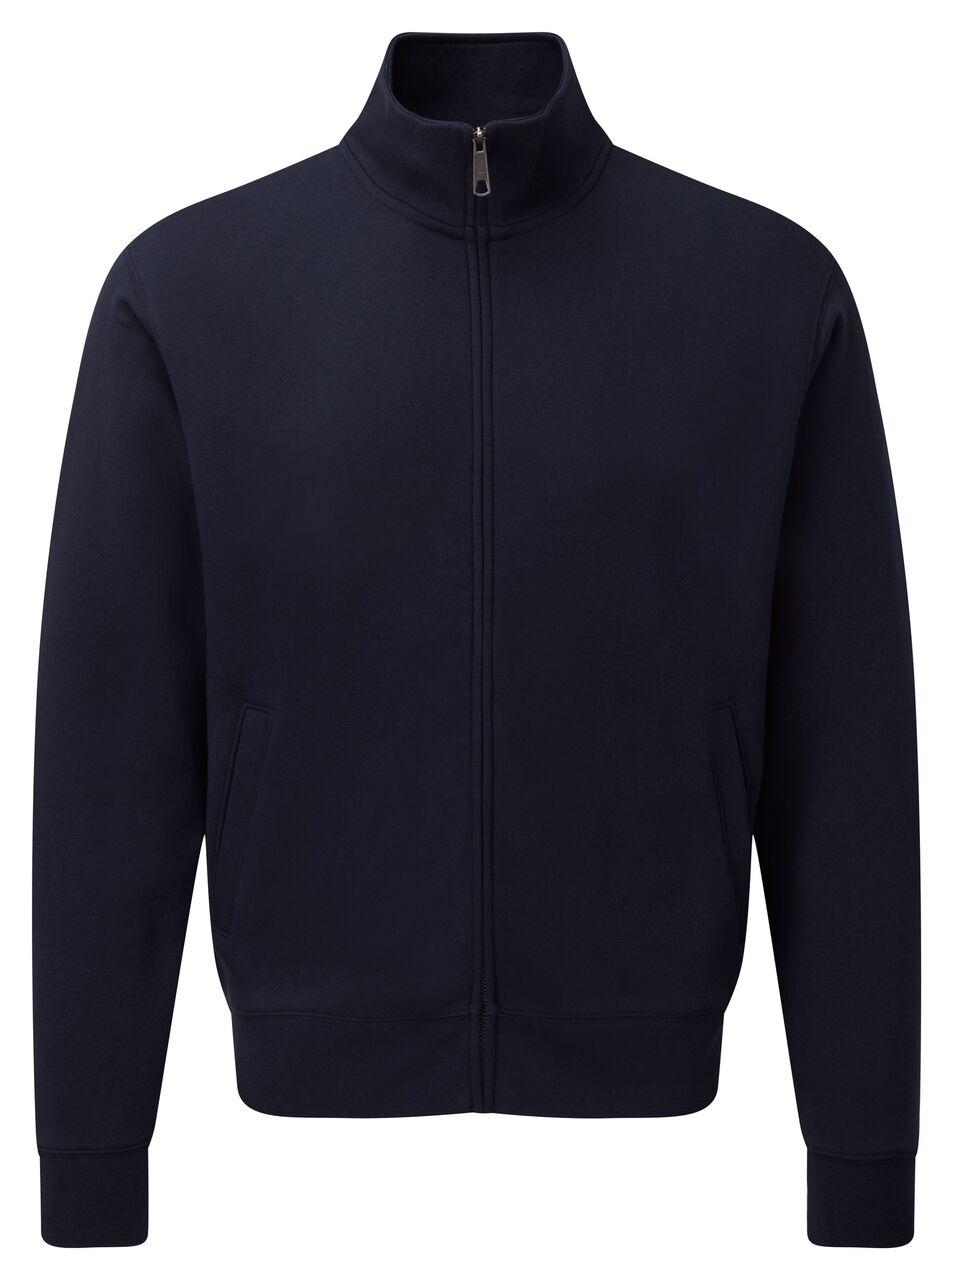 New Mens Russell Self Fabric Full Zipped Authentic Sweatshirt Jacket Size XS-3XL